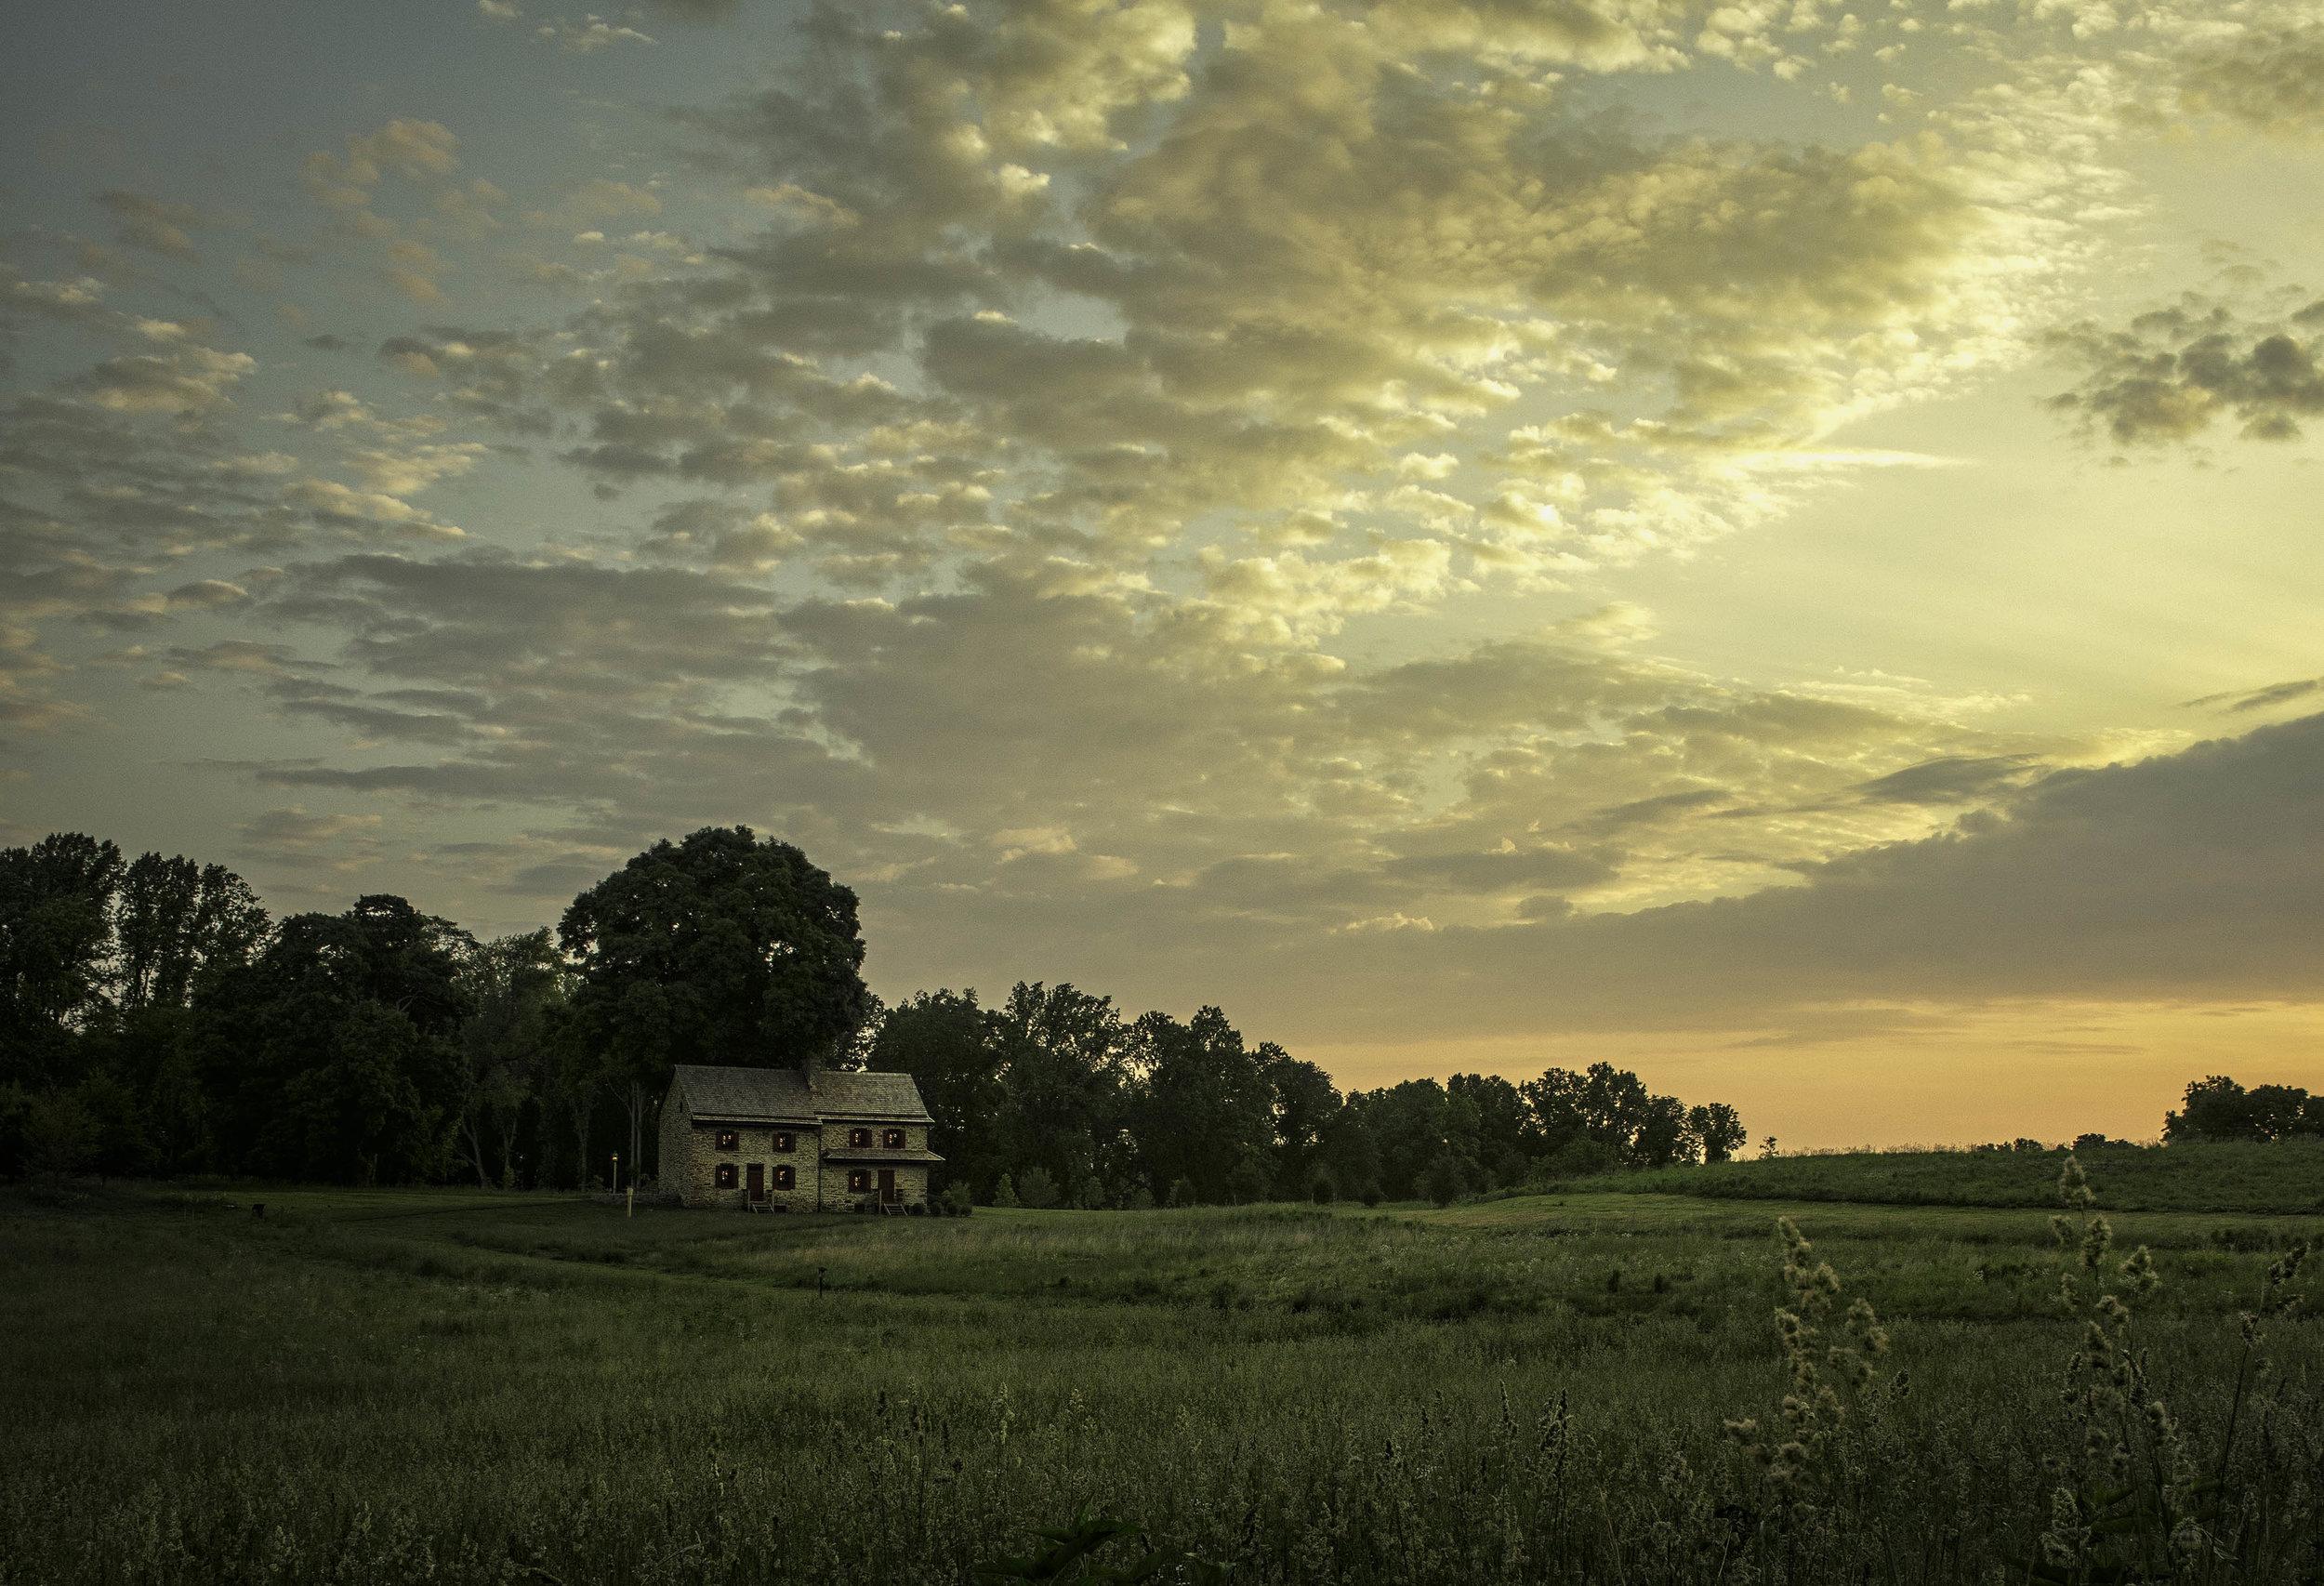 141591_Meadow_Sam Markey Photography.jpg